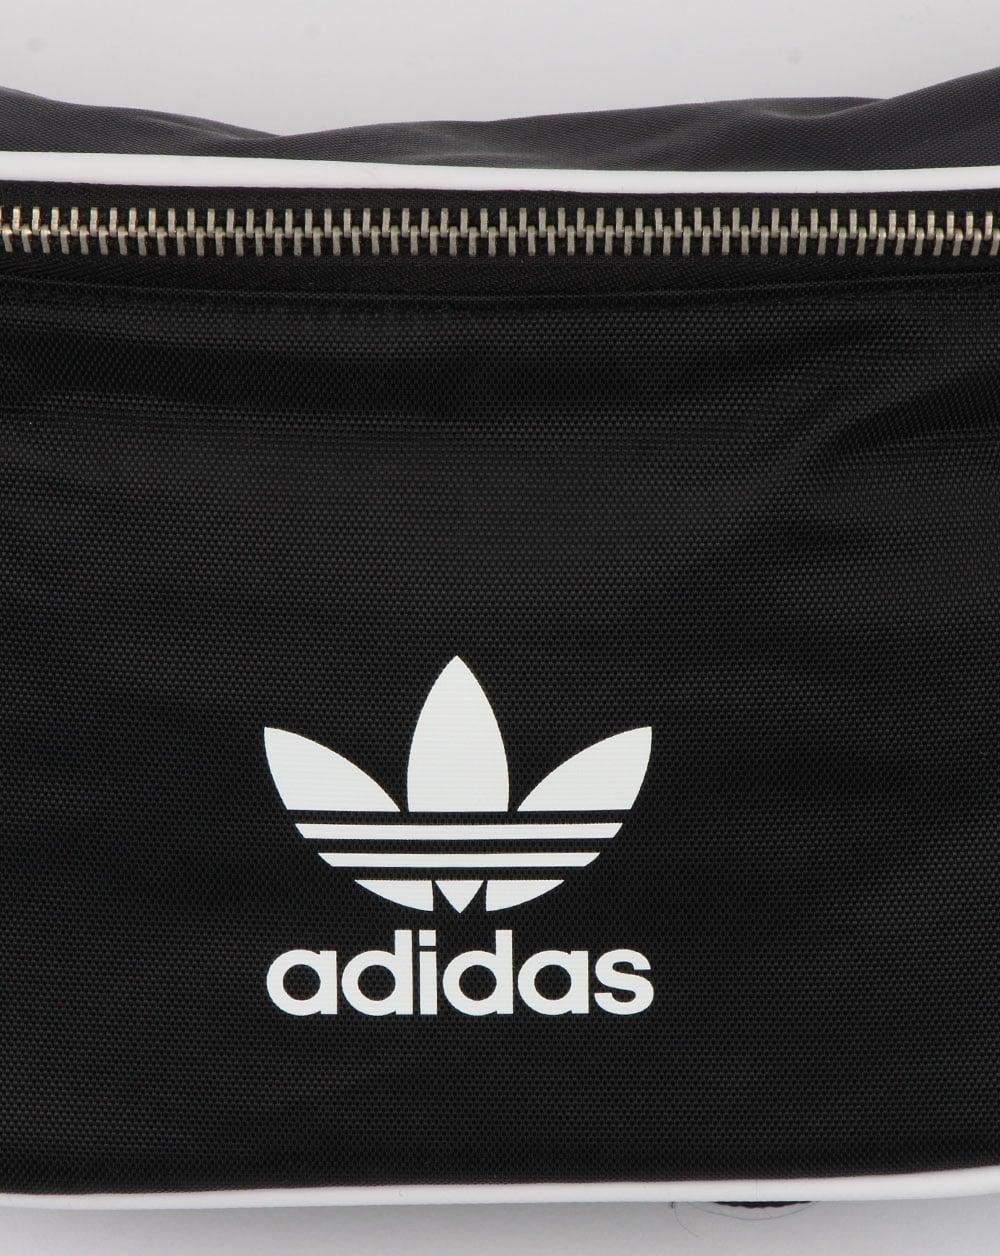 32b610c455 Adidas Originals Adicolor Waist Bag Black